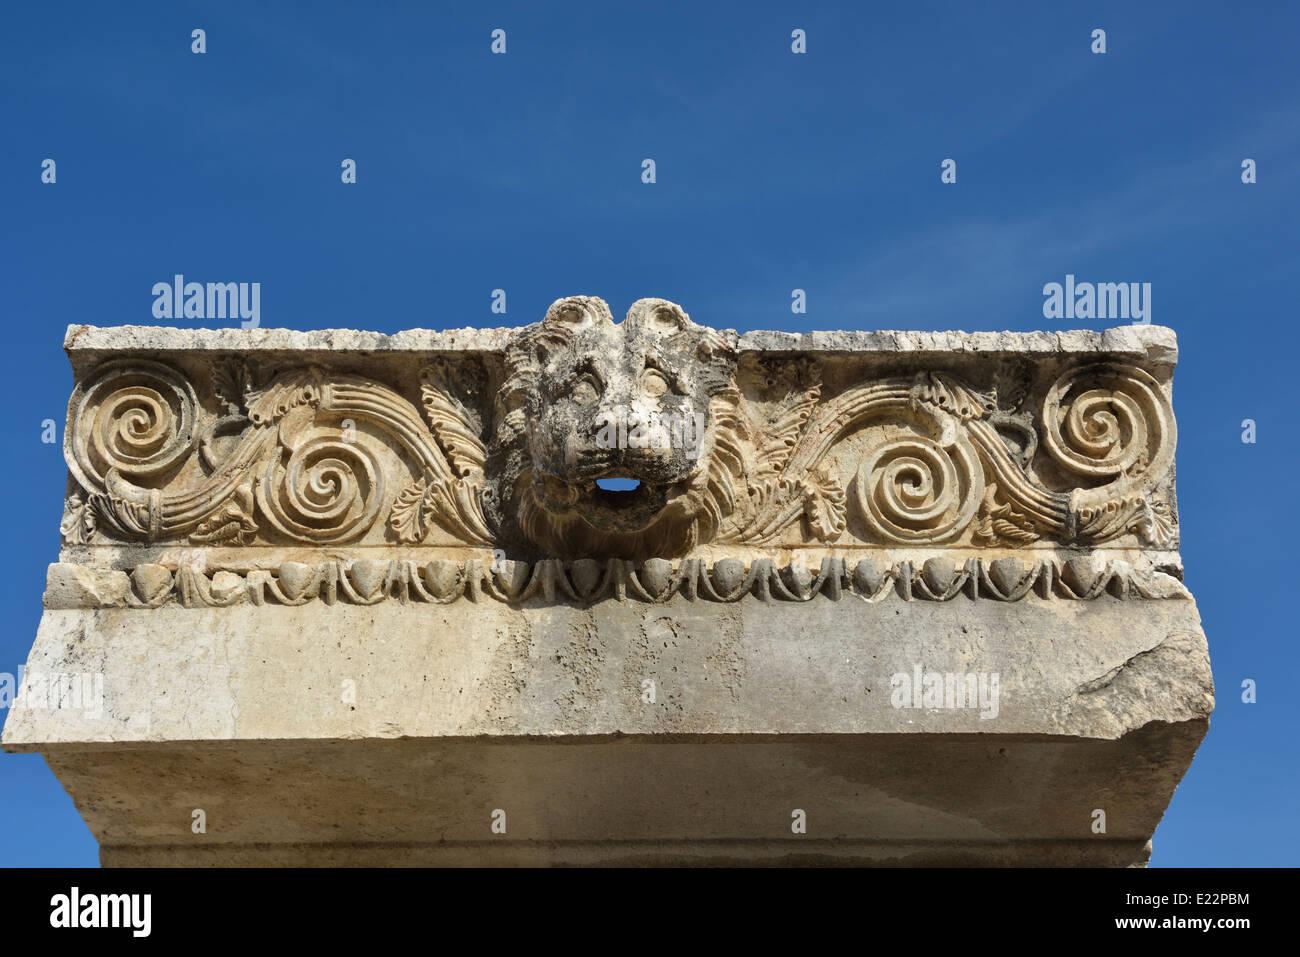 Lion downspout, Letoon, Turkey 140422_60990 - Stock Image